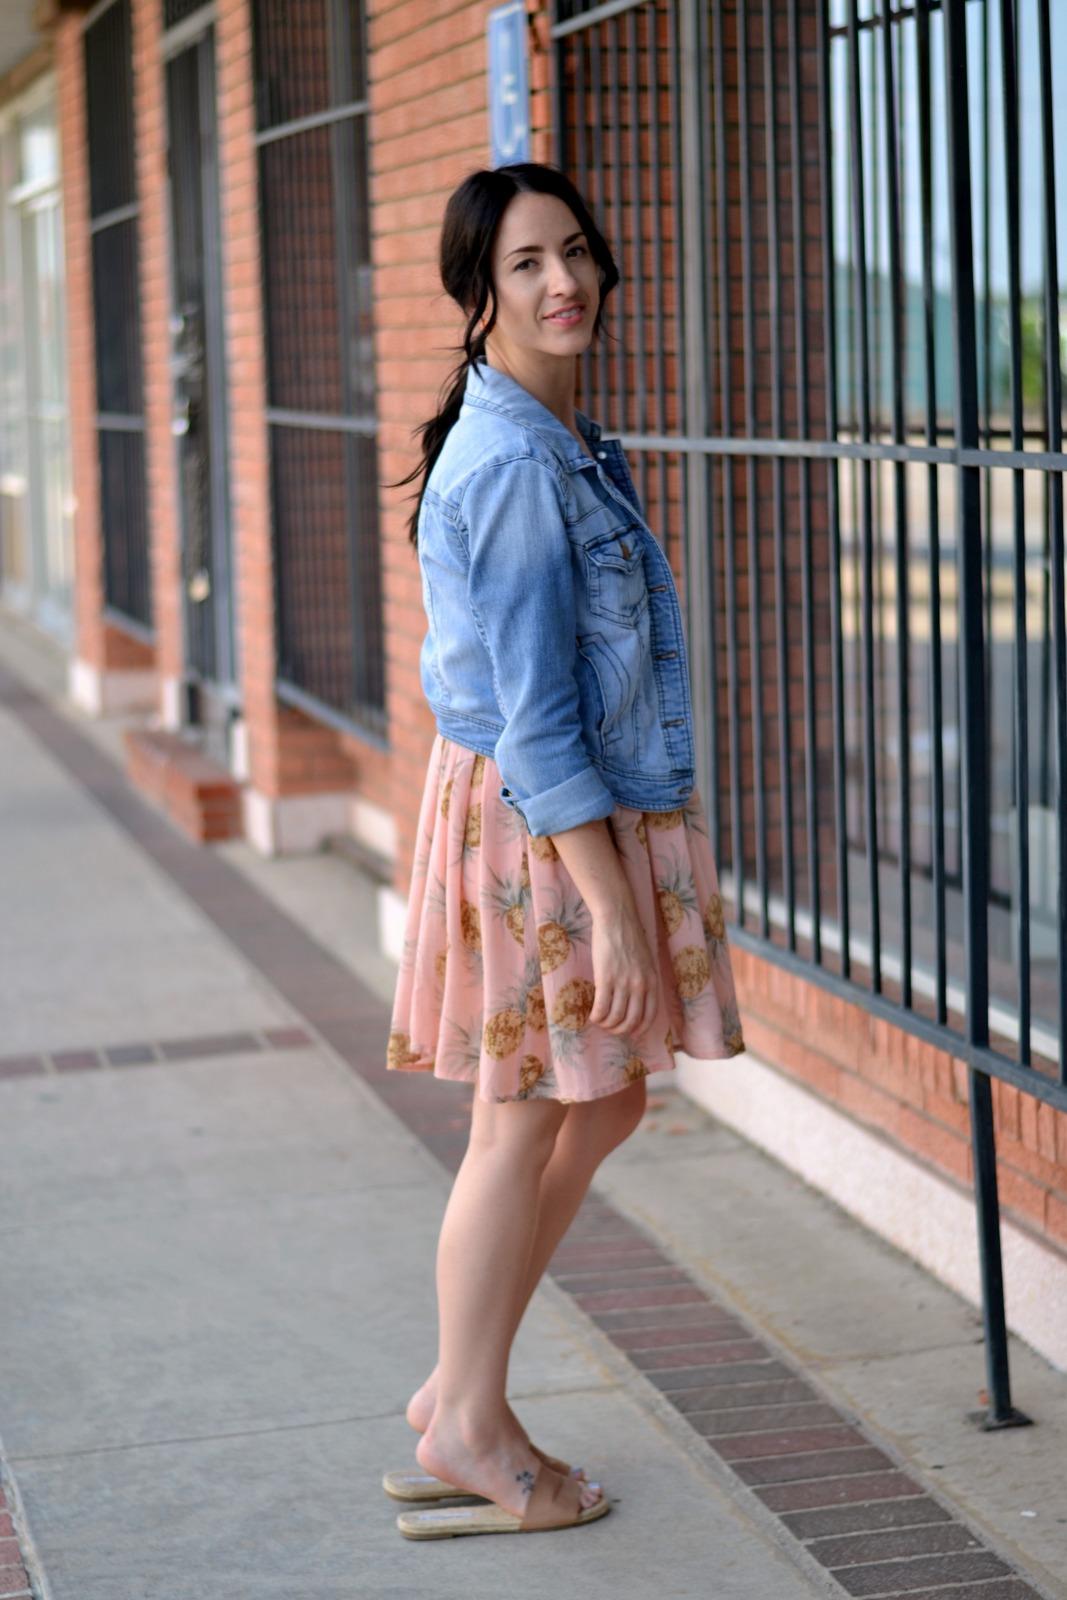 Summer pineapple dress